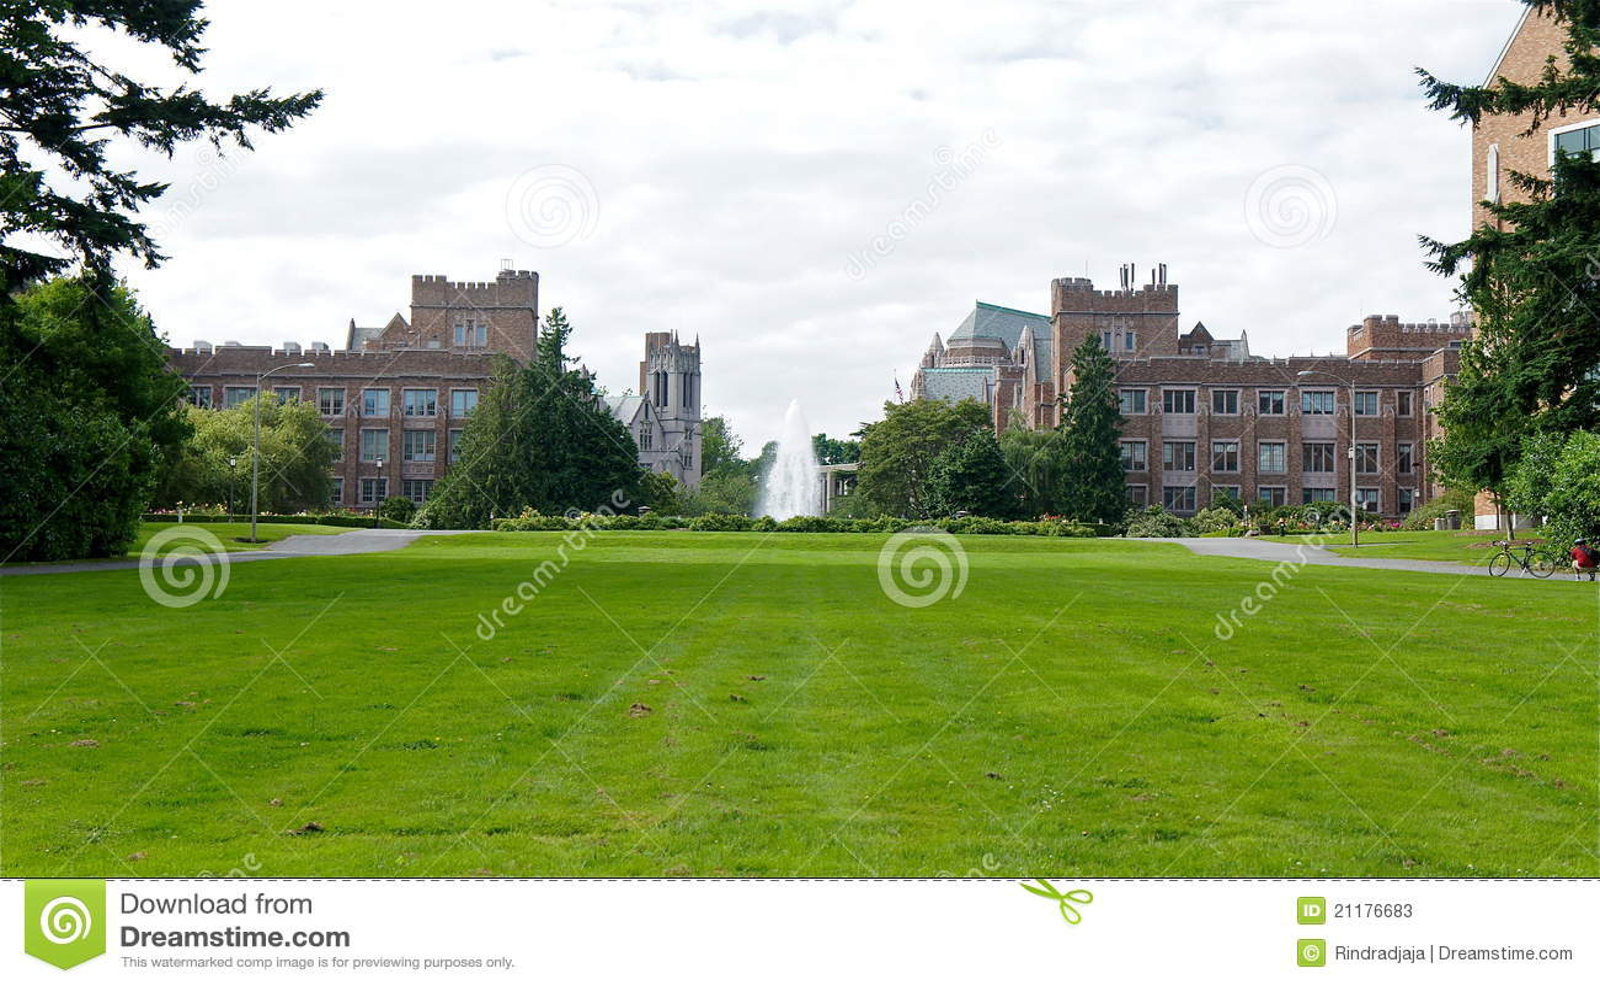 Fountain in University of Washington